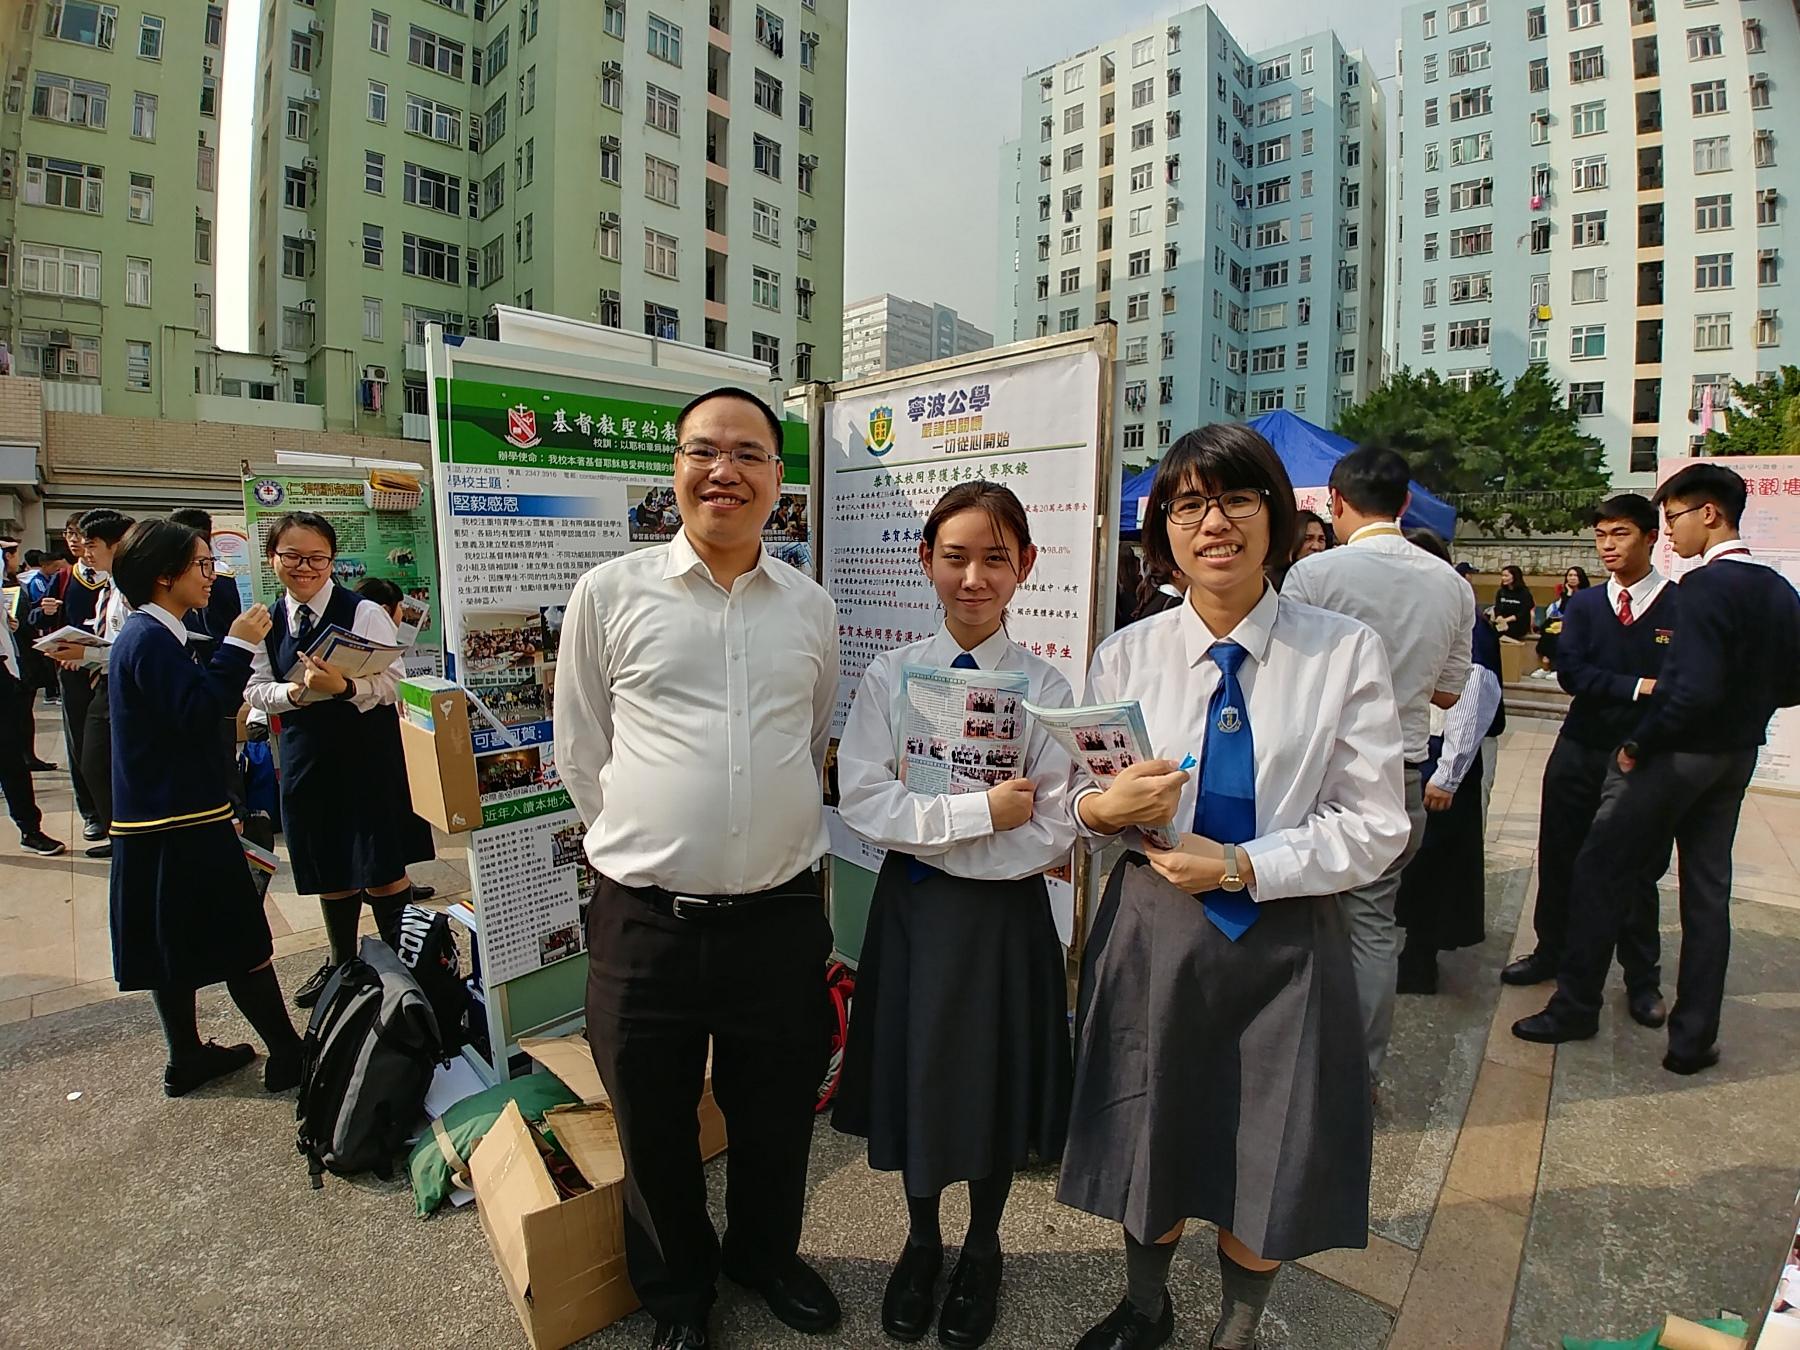 http://npc.edu.hk/sites/default/files/20190112_145236_hdr.jpg